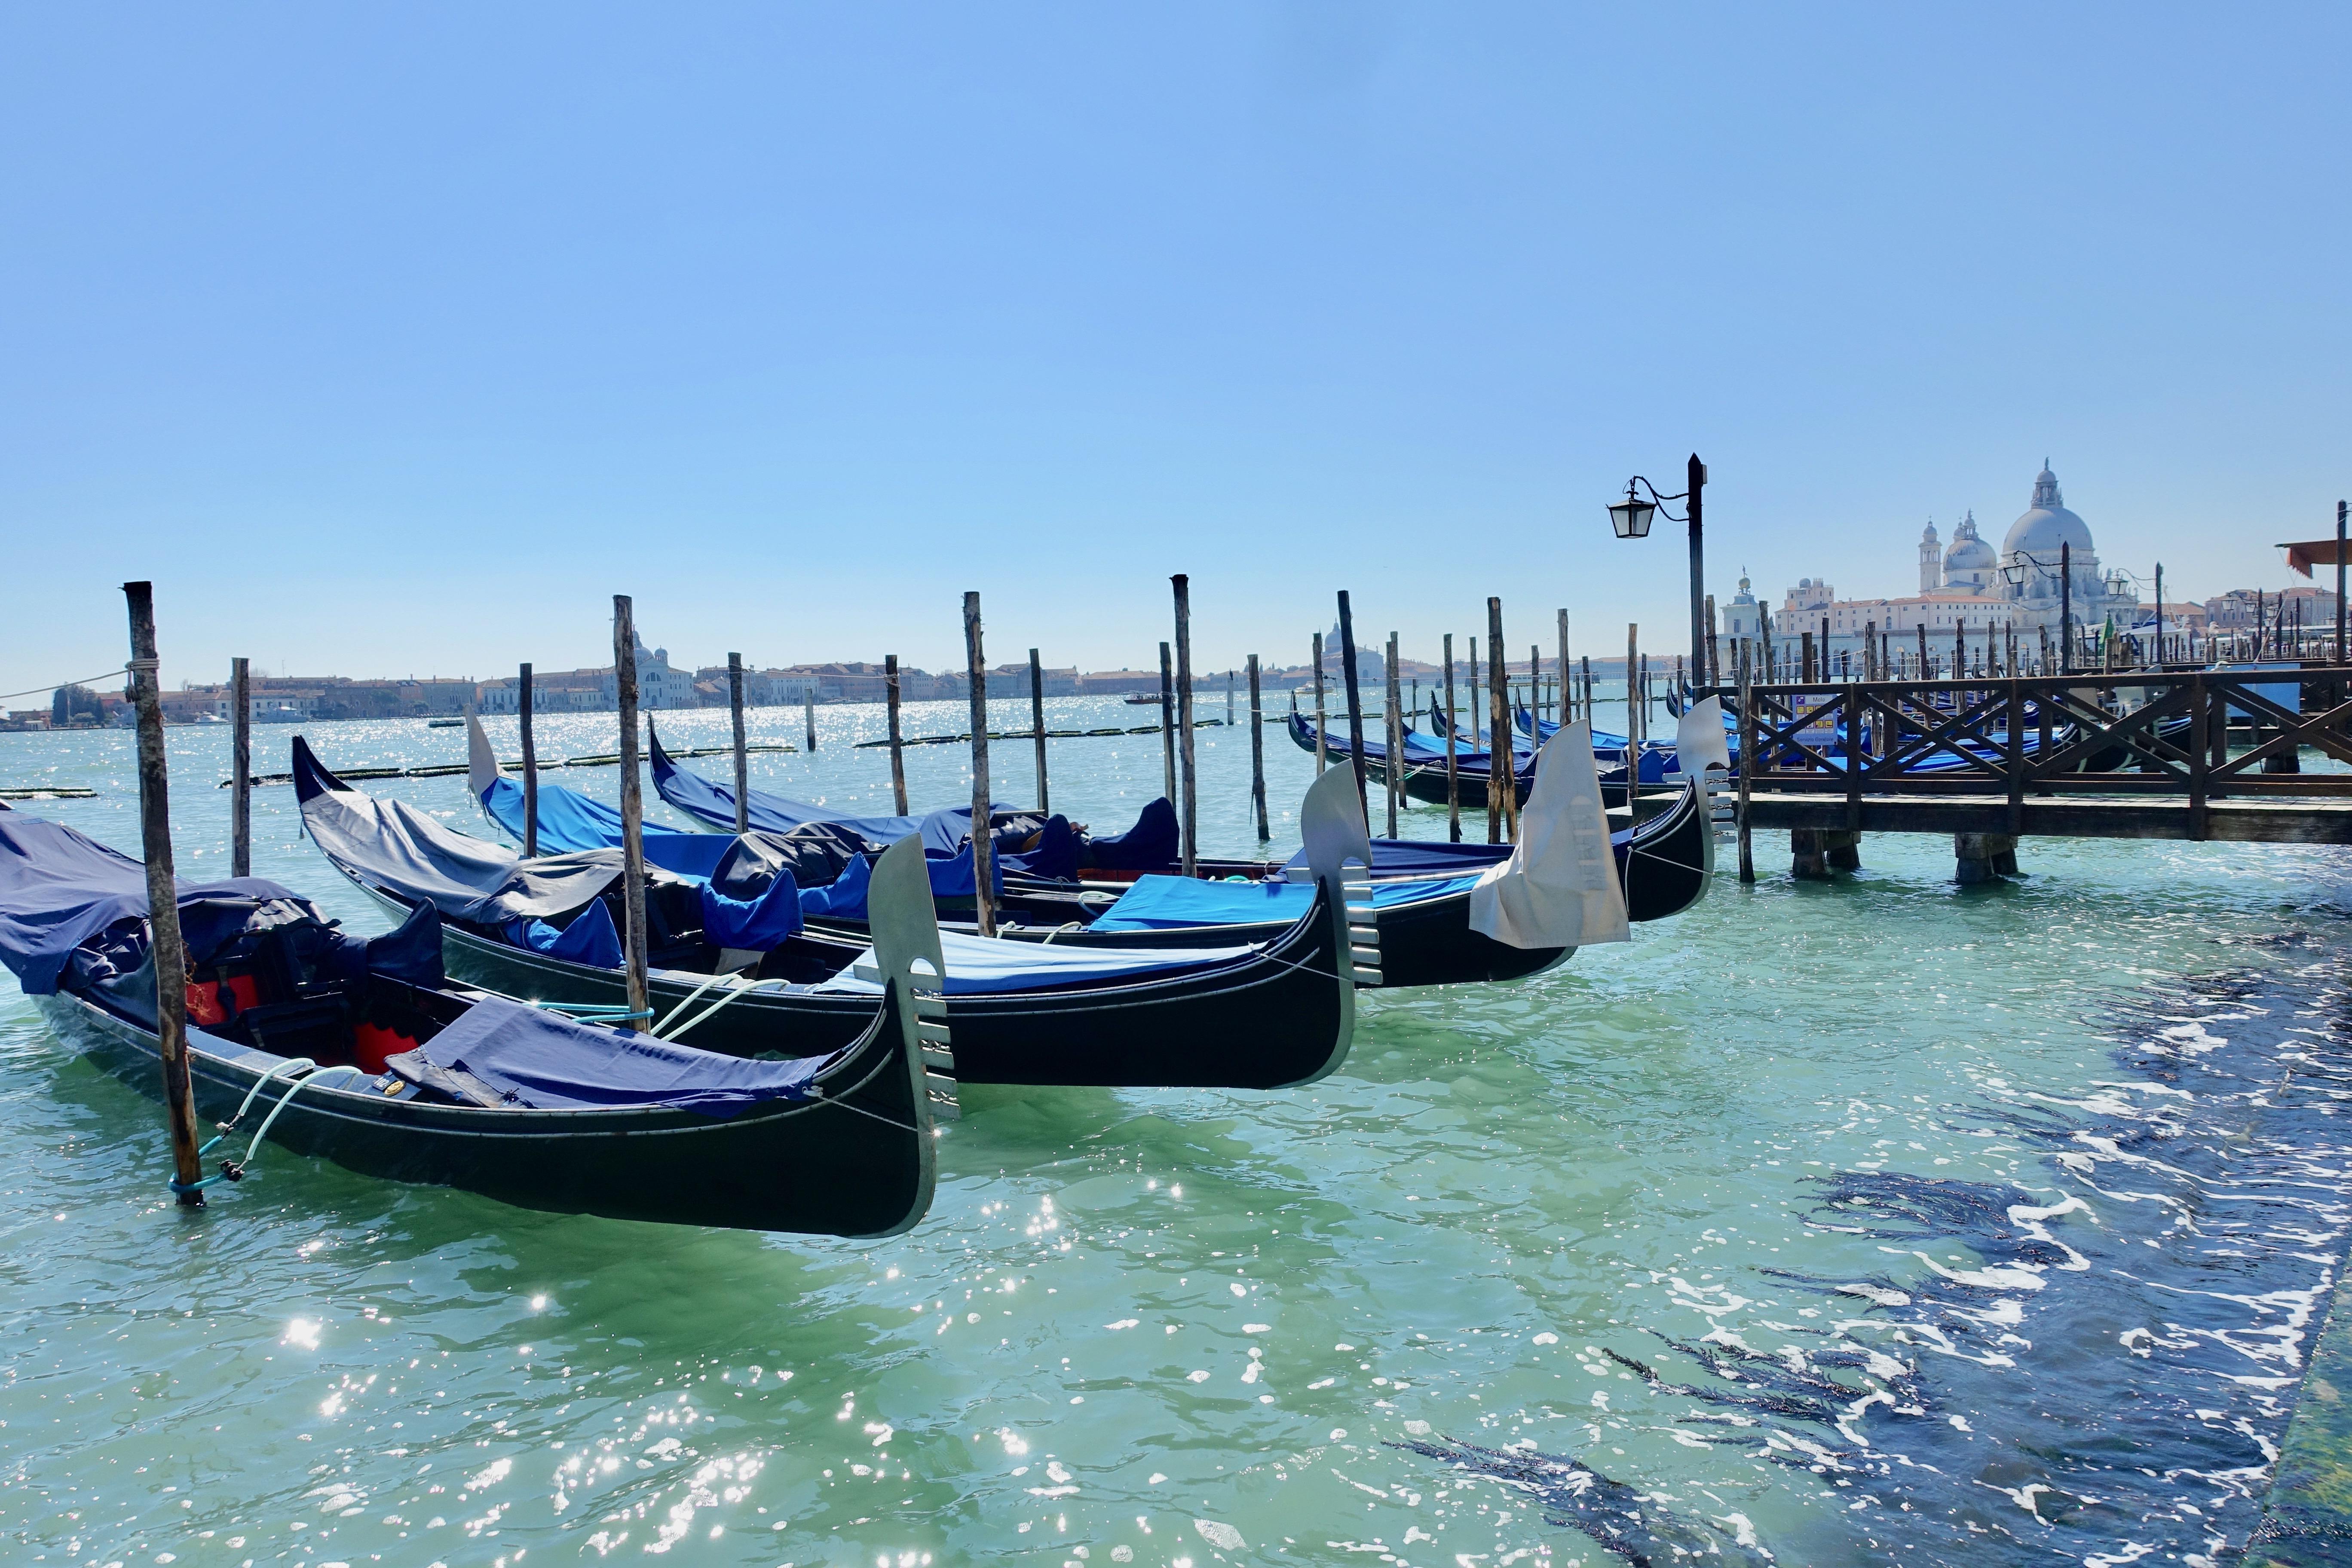 Venedig Reisen: Highlight oder Alptraum?